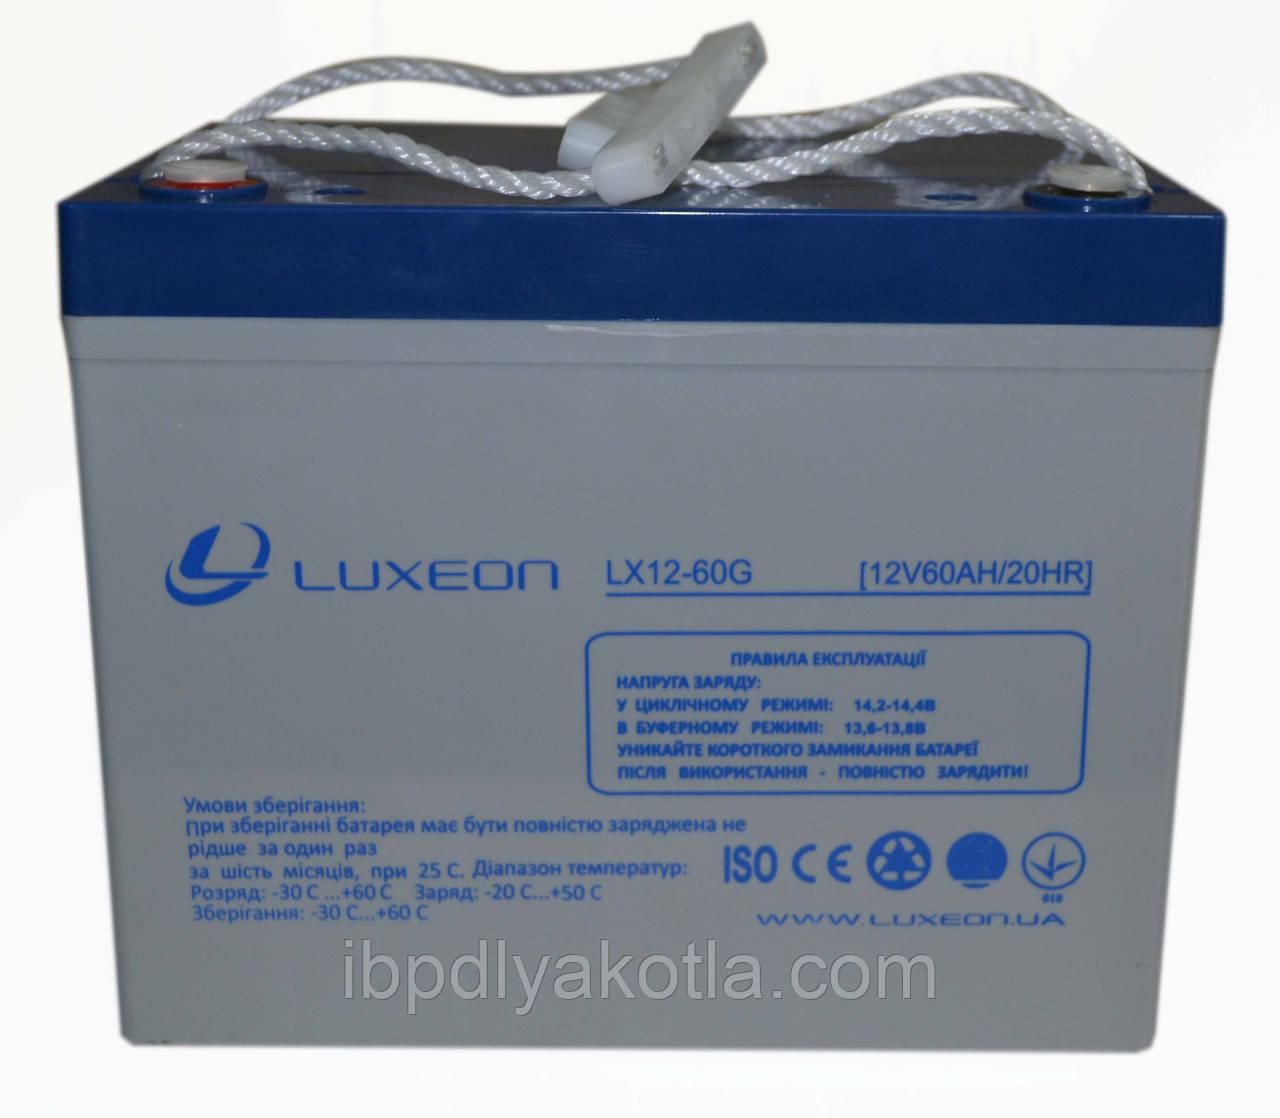 Luxeon LX12-60G 60AH